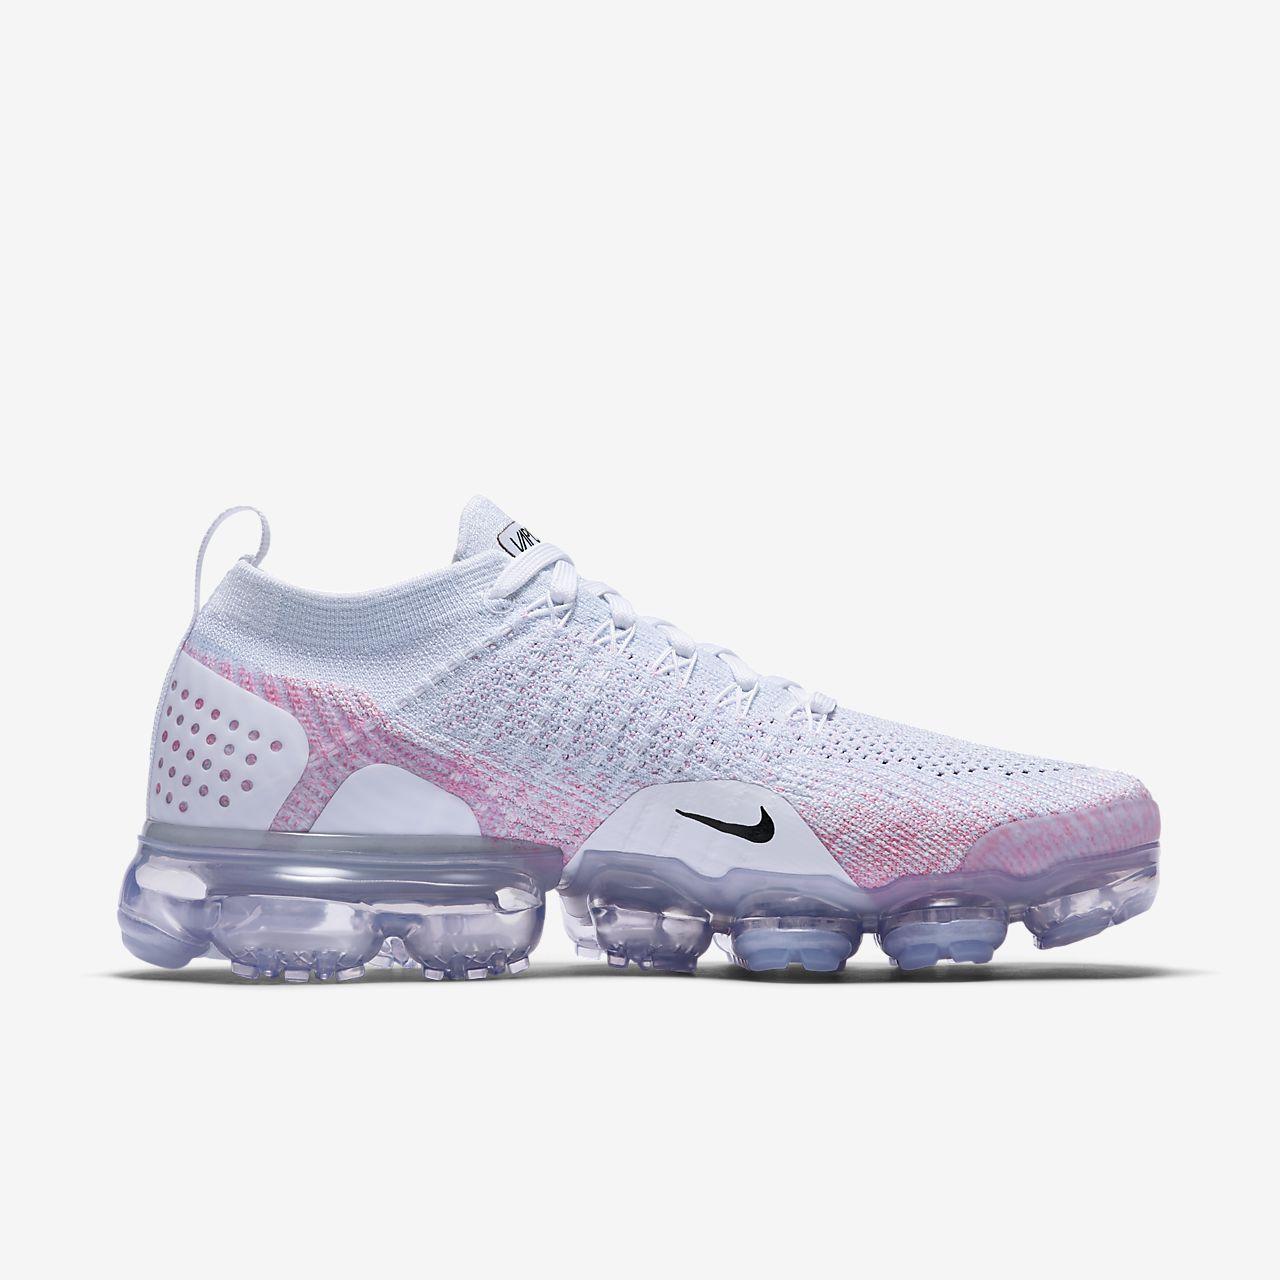 Nike Women S Air Vapormax Flyknit Running Shoes